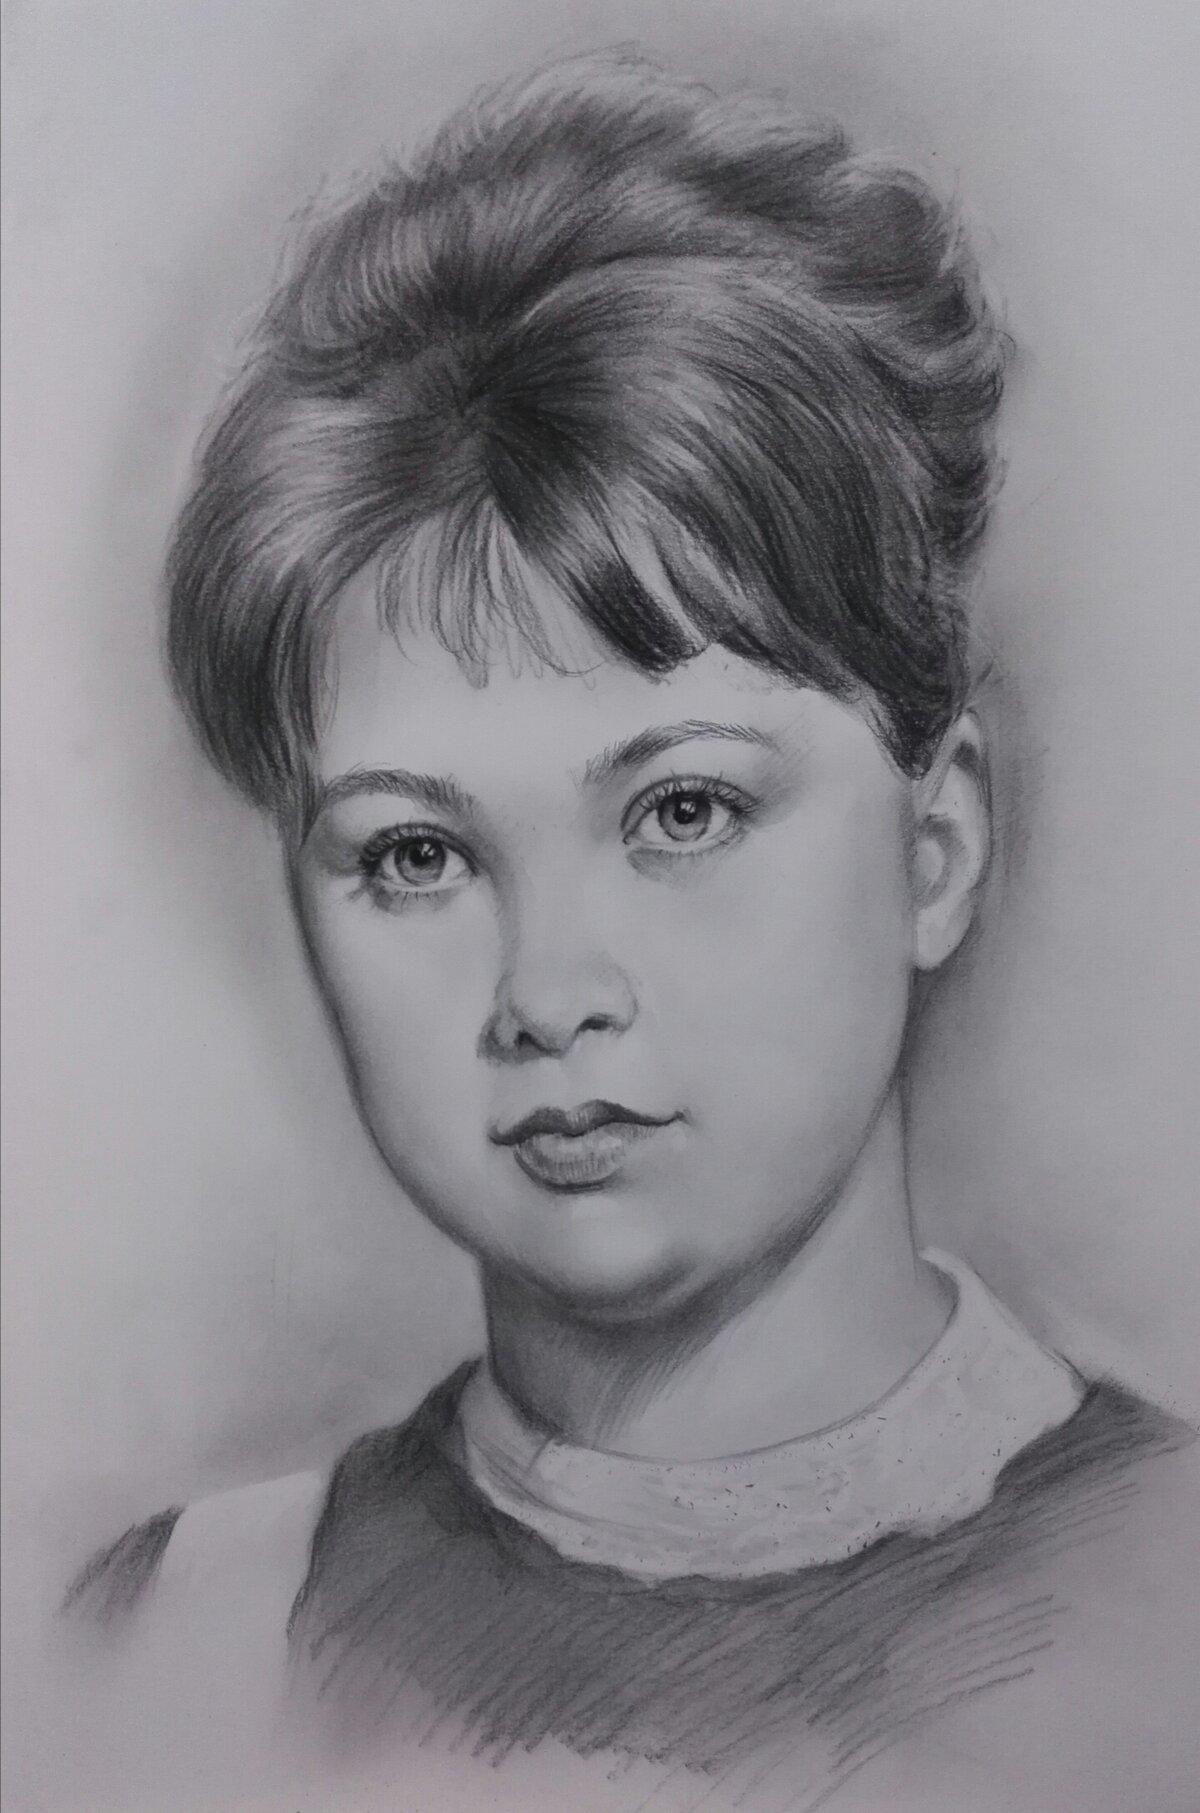 карандашные портреты картинки переносица ребенка, лоб